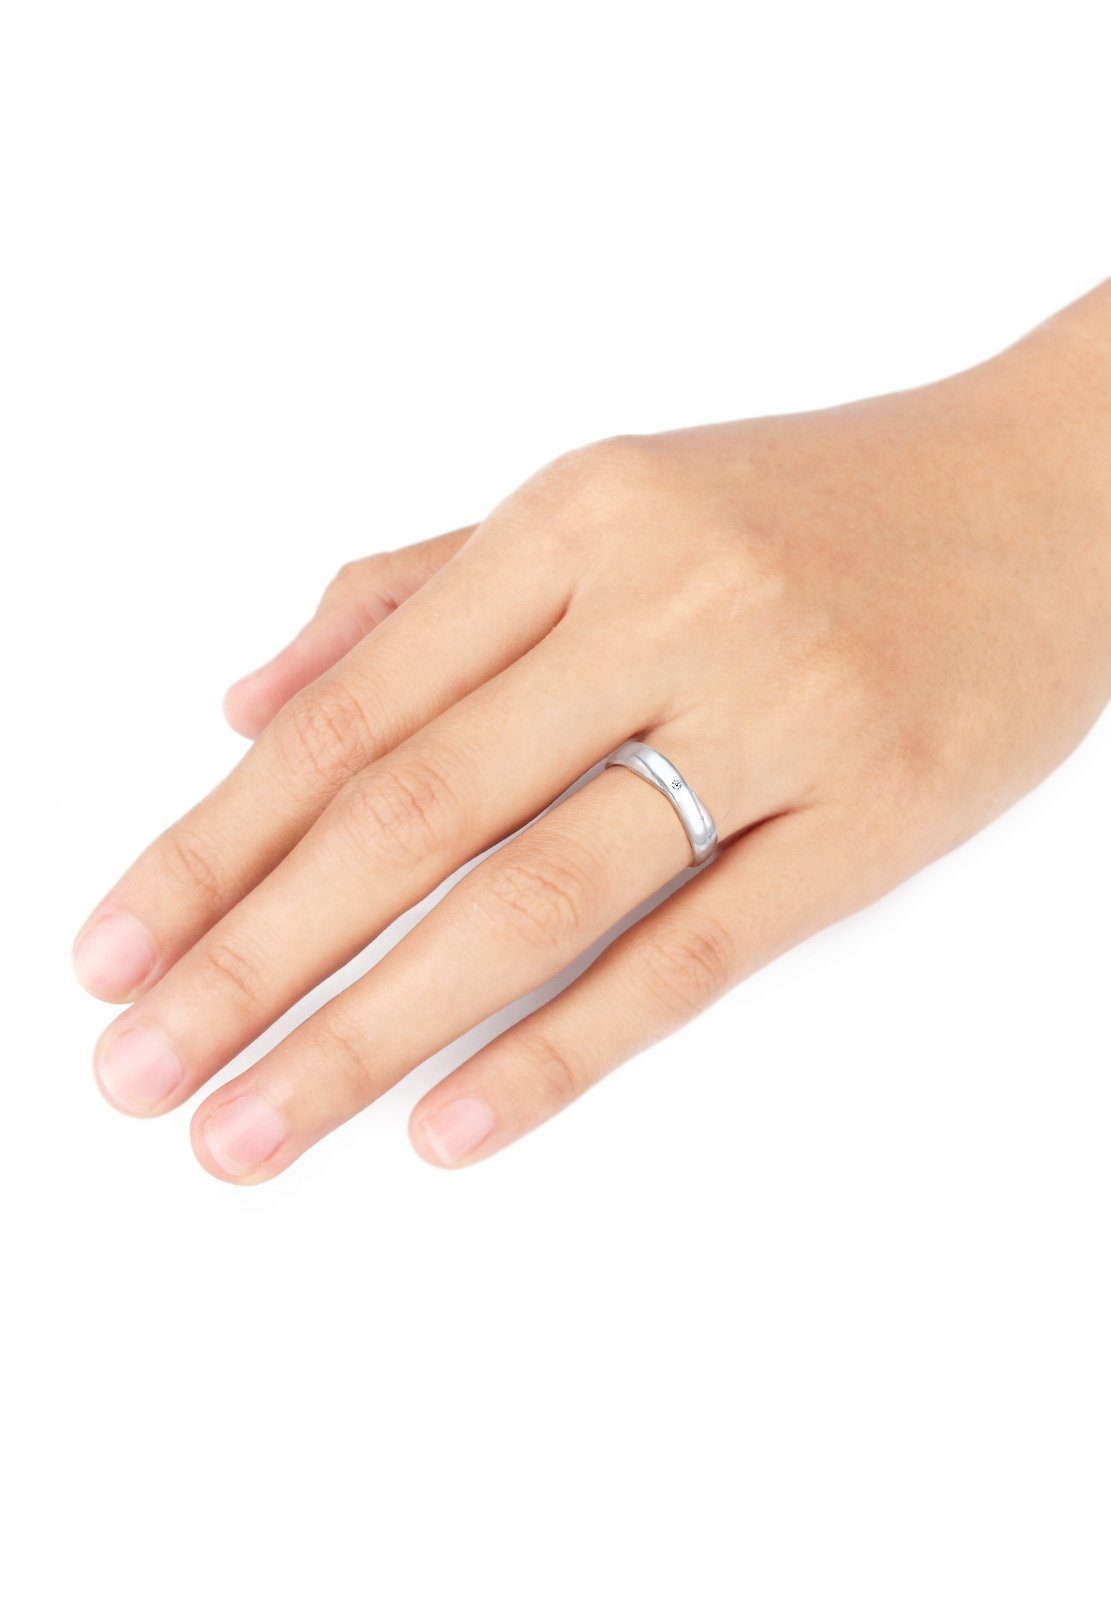 Verlobung »geschenkidee Diamant Ring Silber« Kaufen 02 Diamore 0 Online Ct925 E9H2YIWD